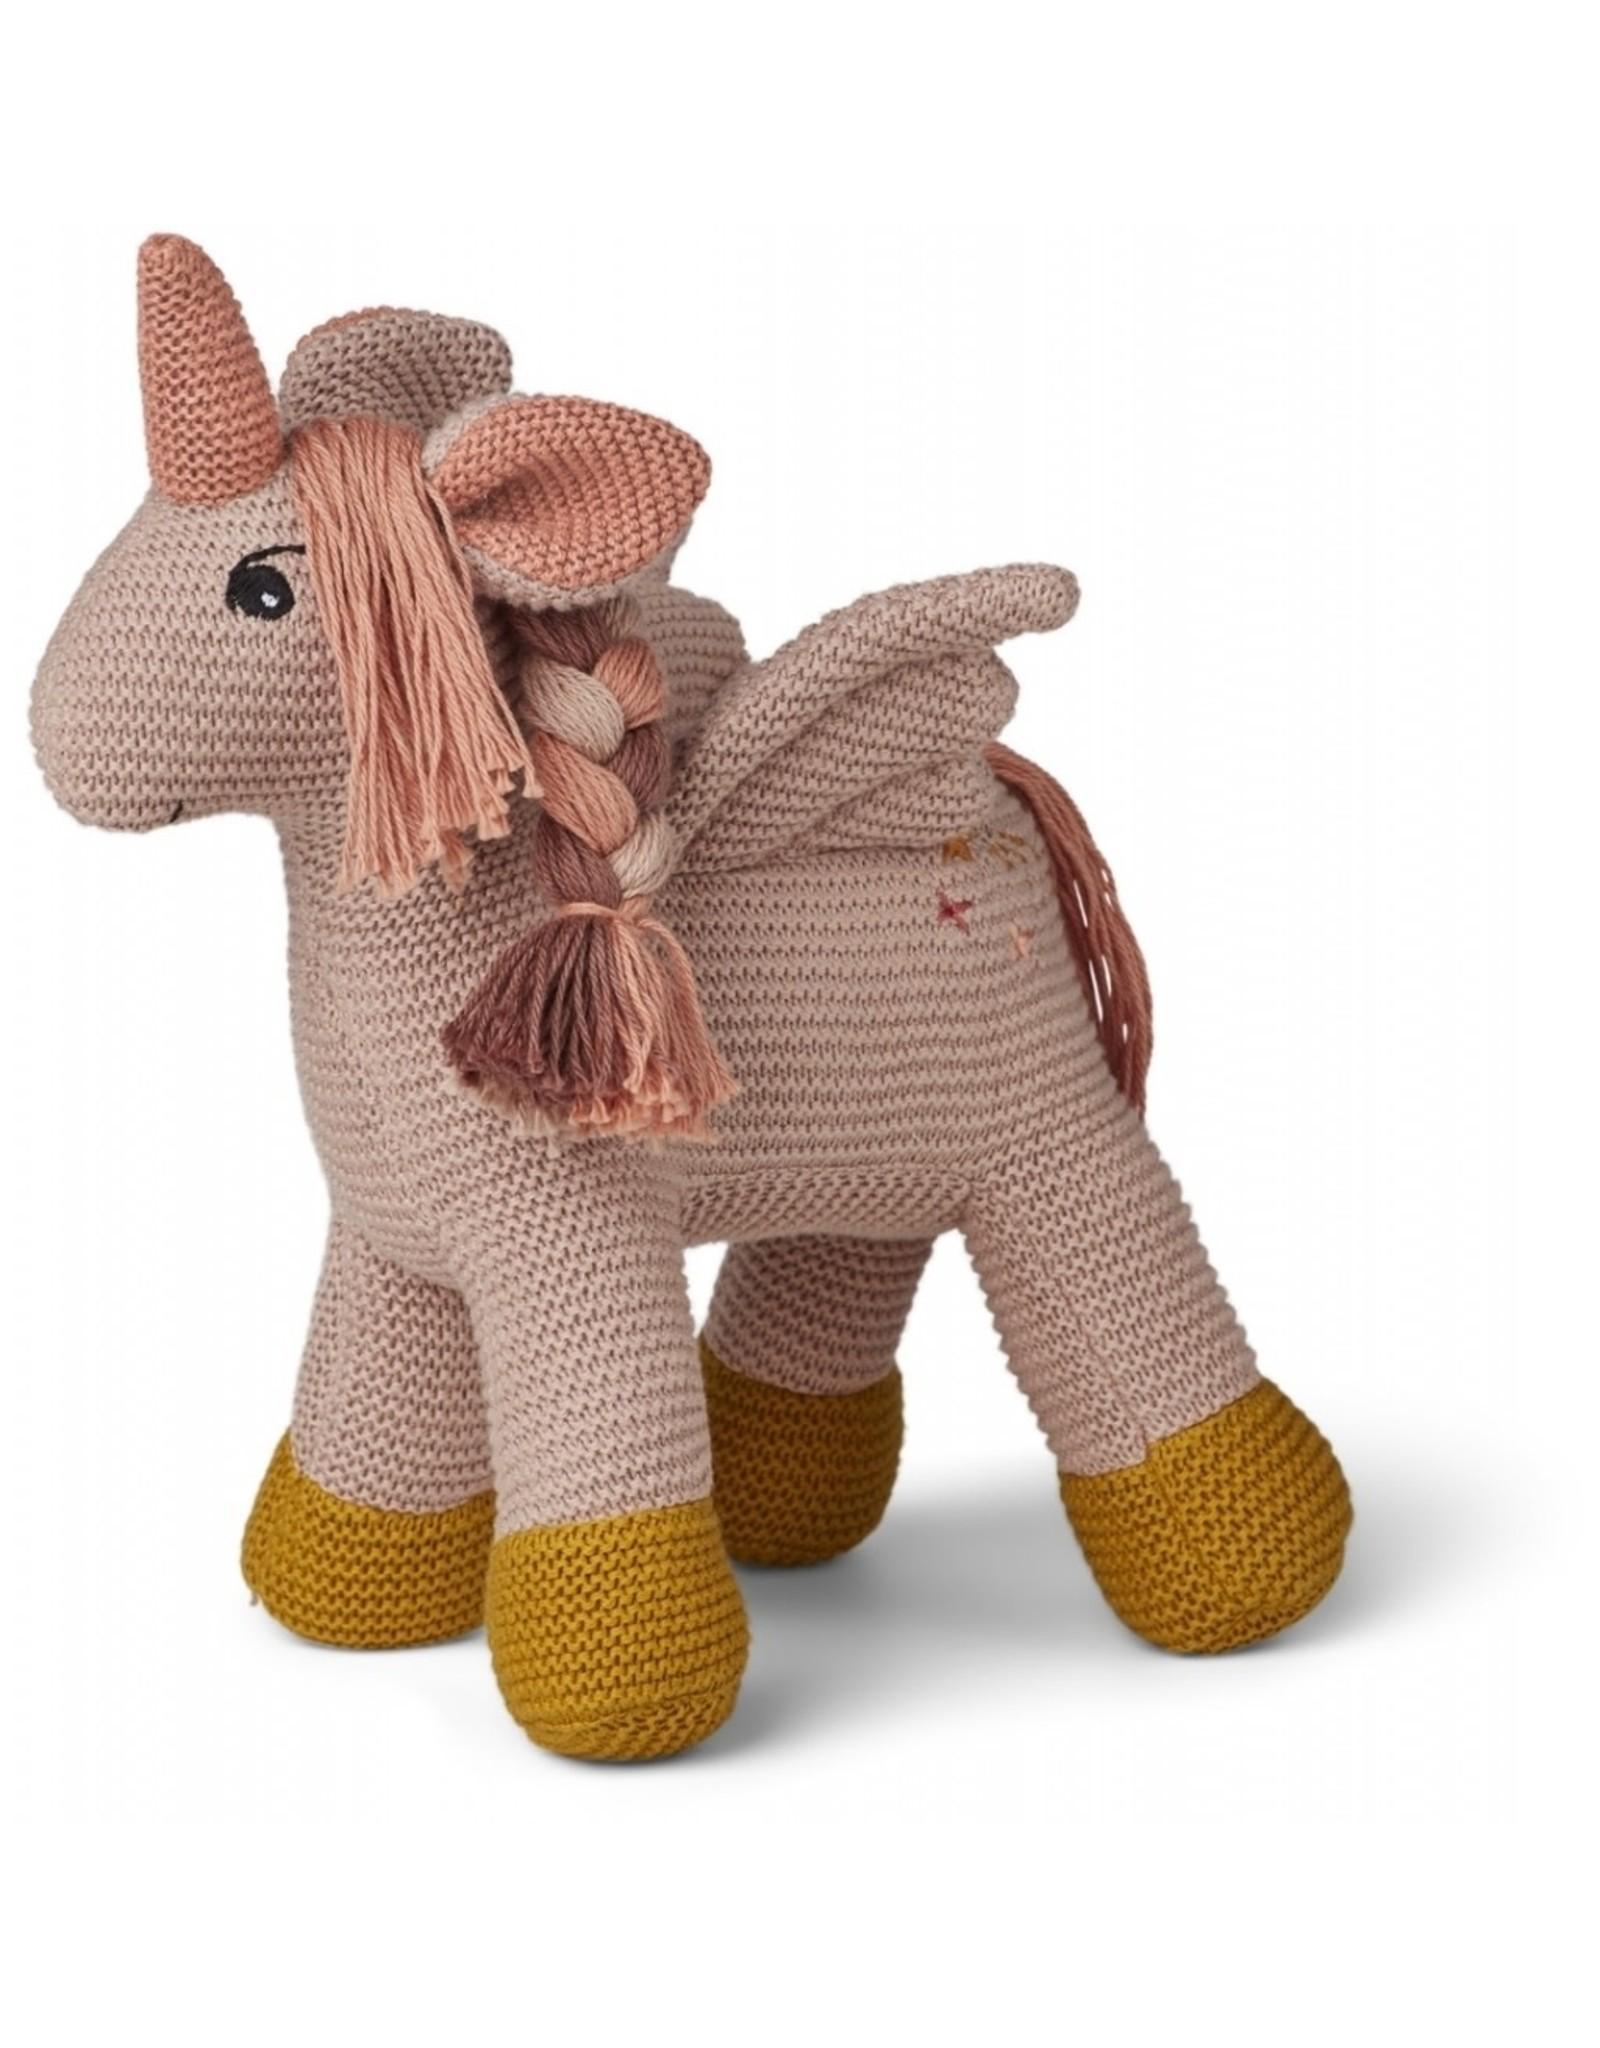 Liewood Liewood Adiana knitted teddy unicorn sorbet rose